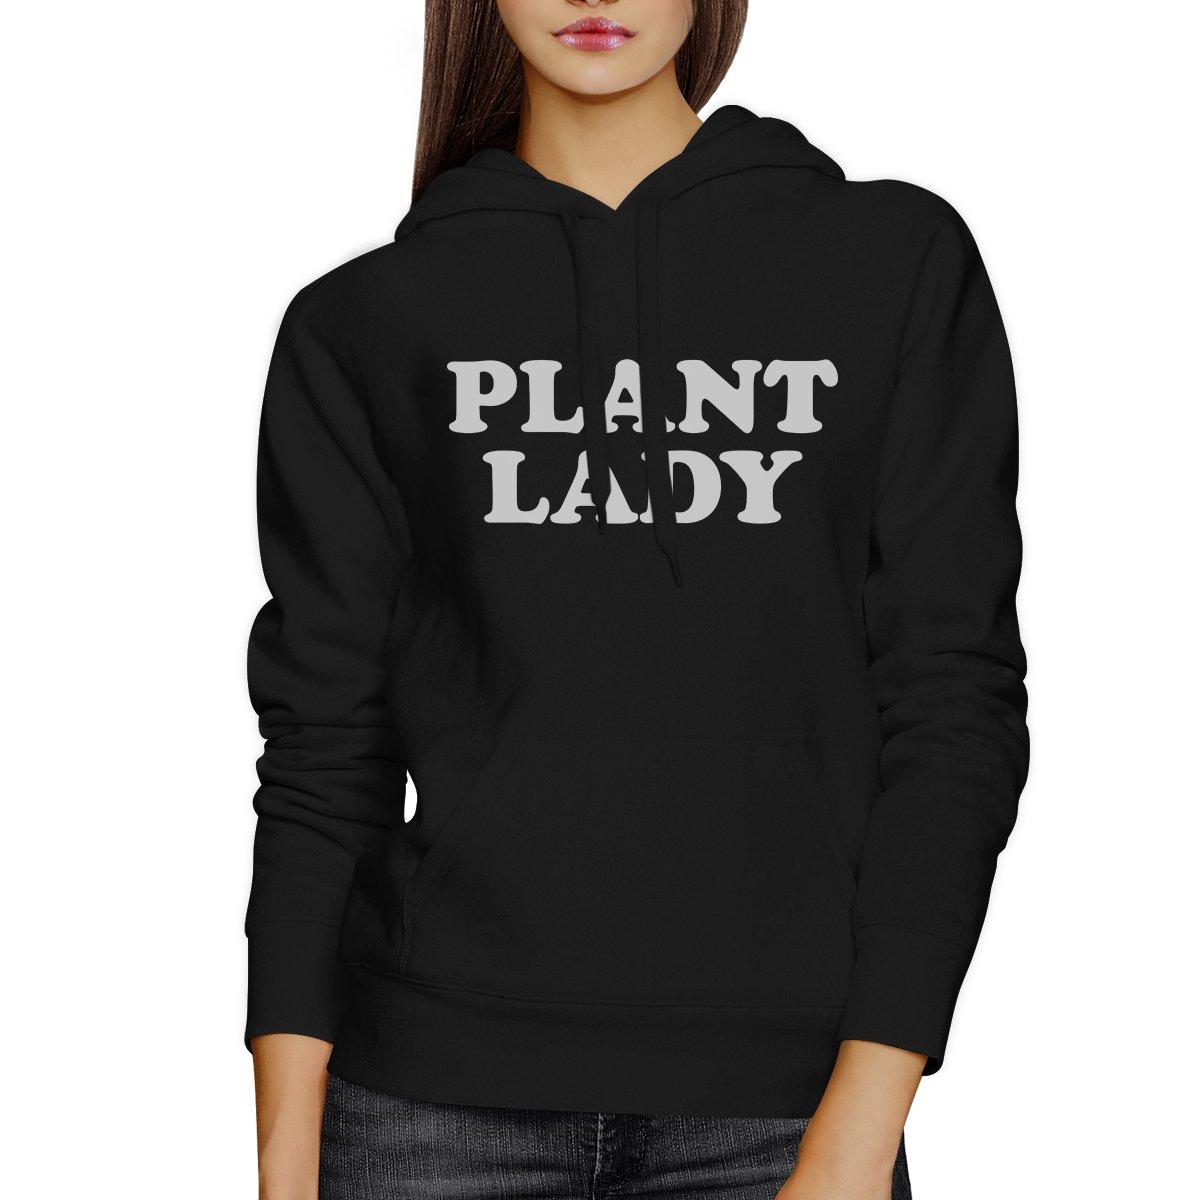 365 Printing Black Unisex Hoodie Sweatshirt Cute Flower Graphic Fleece Gift Idea 365 Printing inc SSHD_01_REGULAR